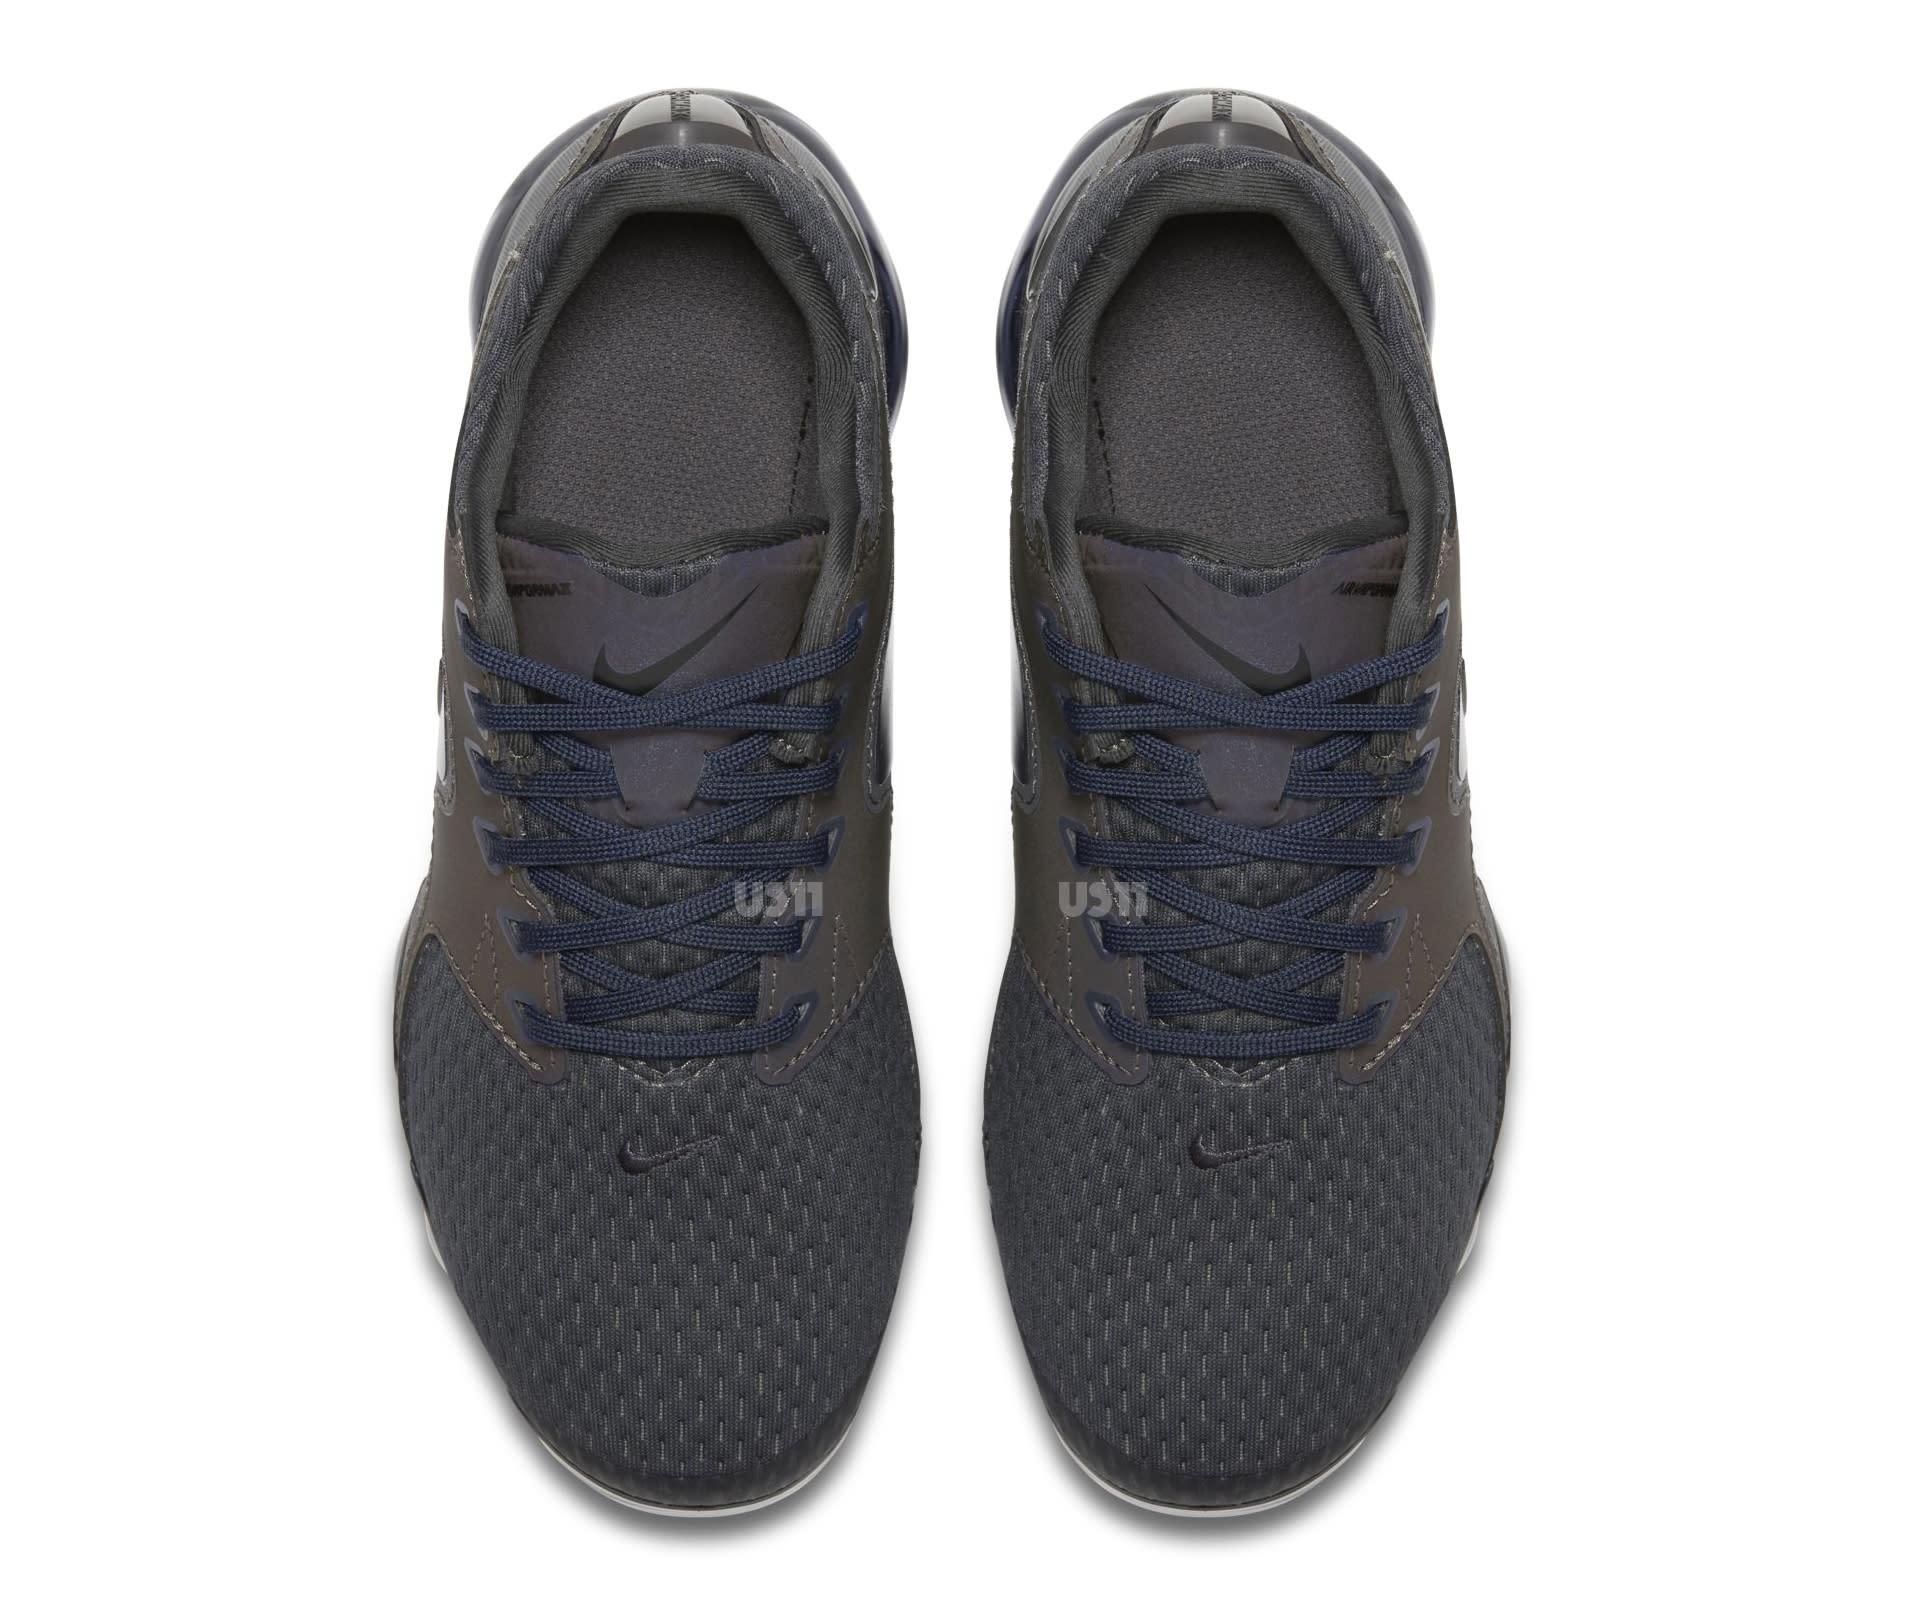 233fa1f6f37b03 ... Image via US11 · Nike VaporMax CS GS Top ...